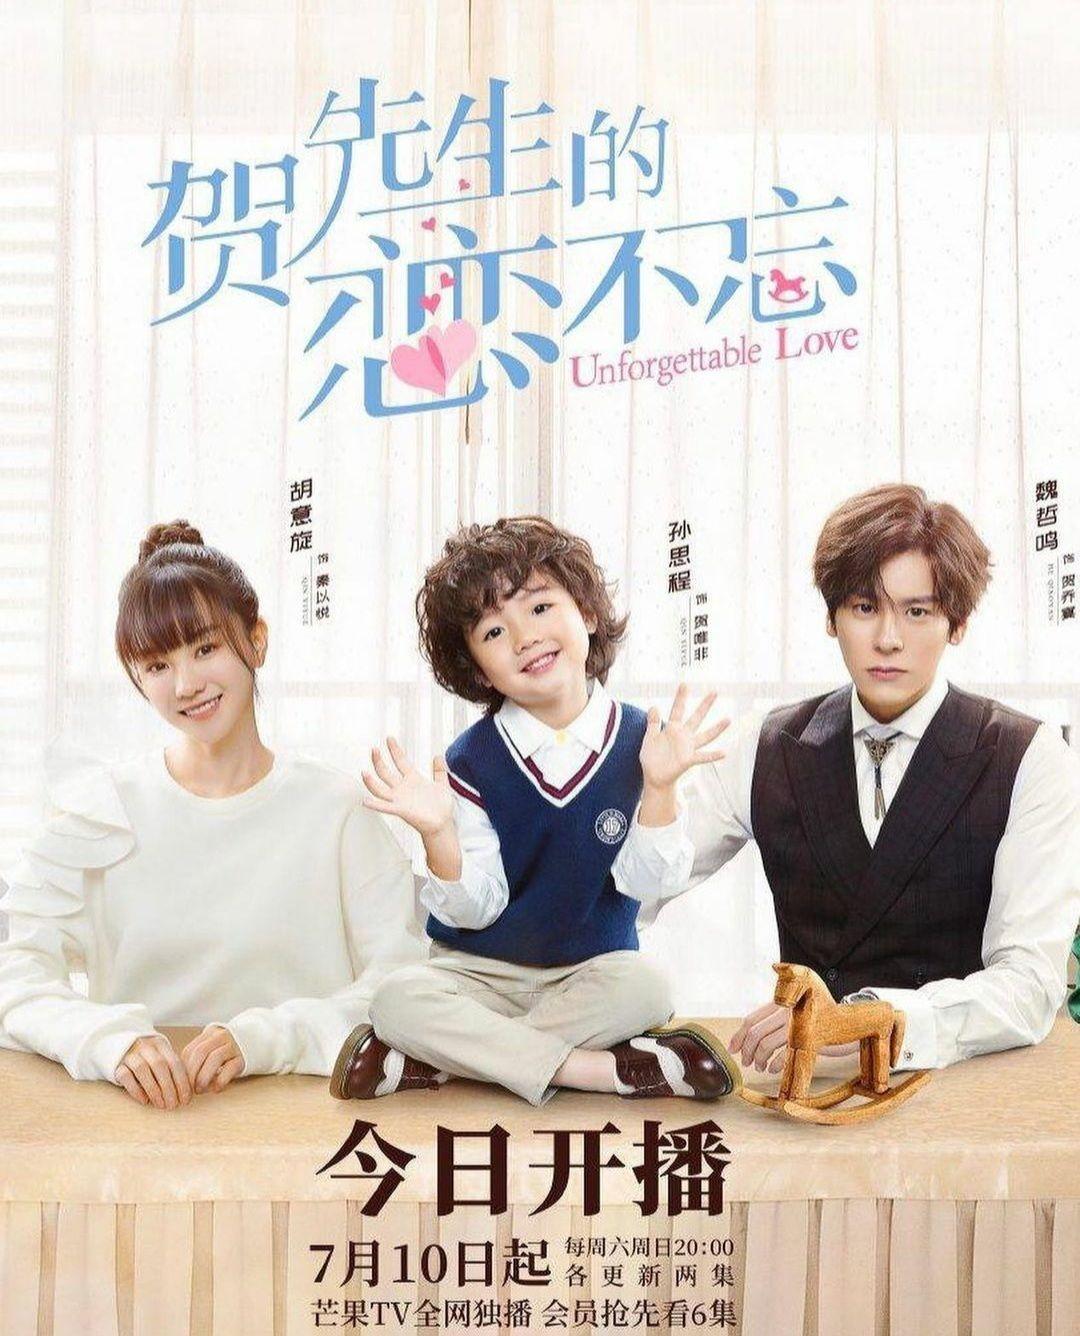 Phim Hạ Tiên Sinh Lưu Luyến Không Quên - Unforgettable Love (He Xian Sheng De Lian Lian Bu Wang) (2021)